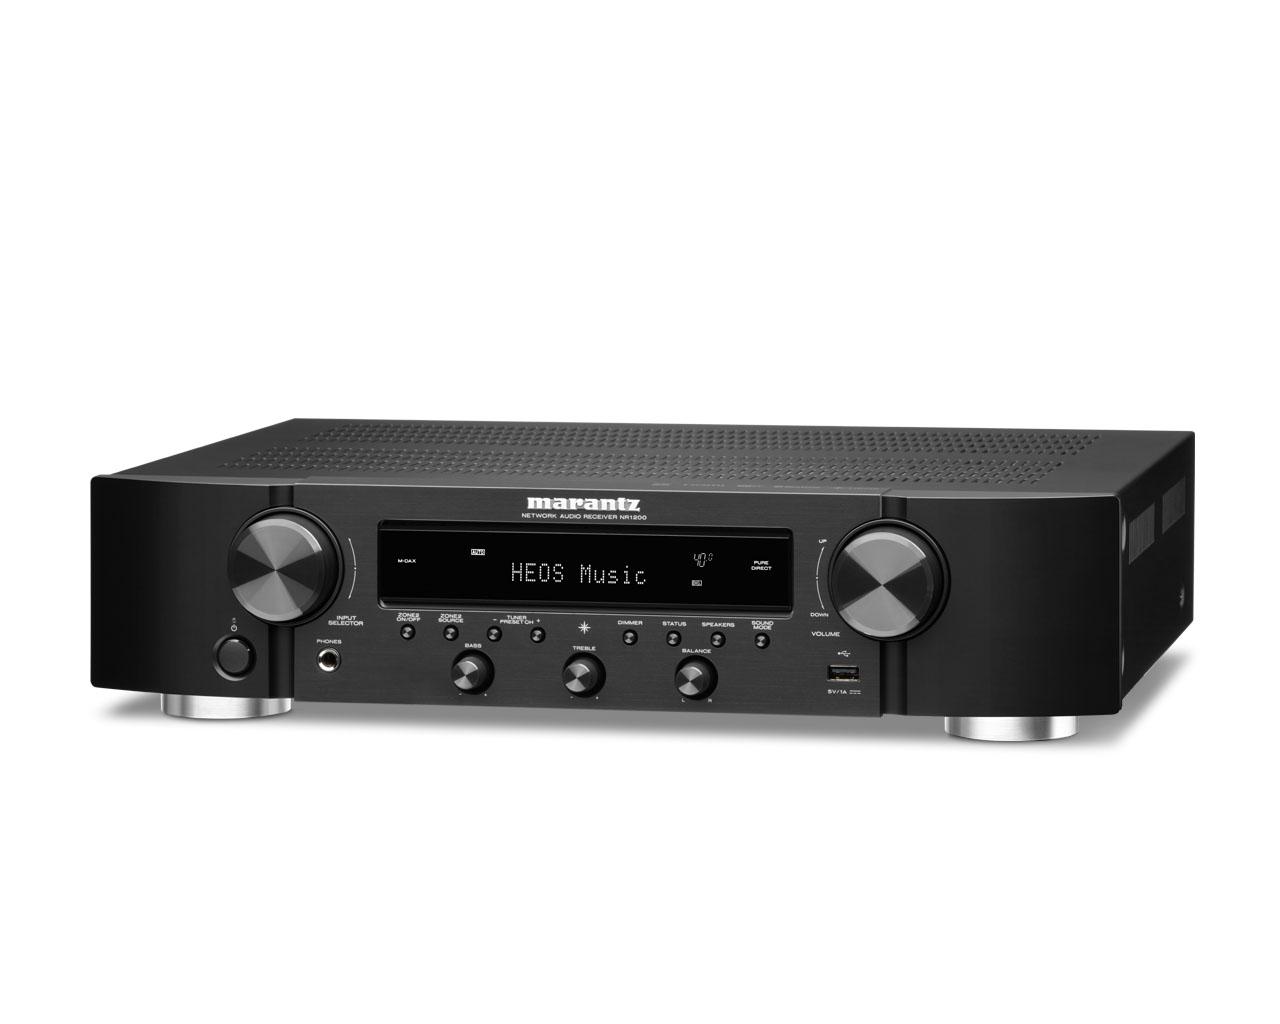 Marantz NR 1200 AV-Receiver kompakter Stereo-Netzwerk-Receiver mit HEOS